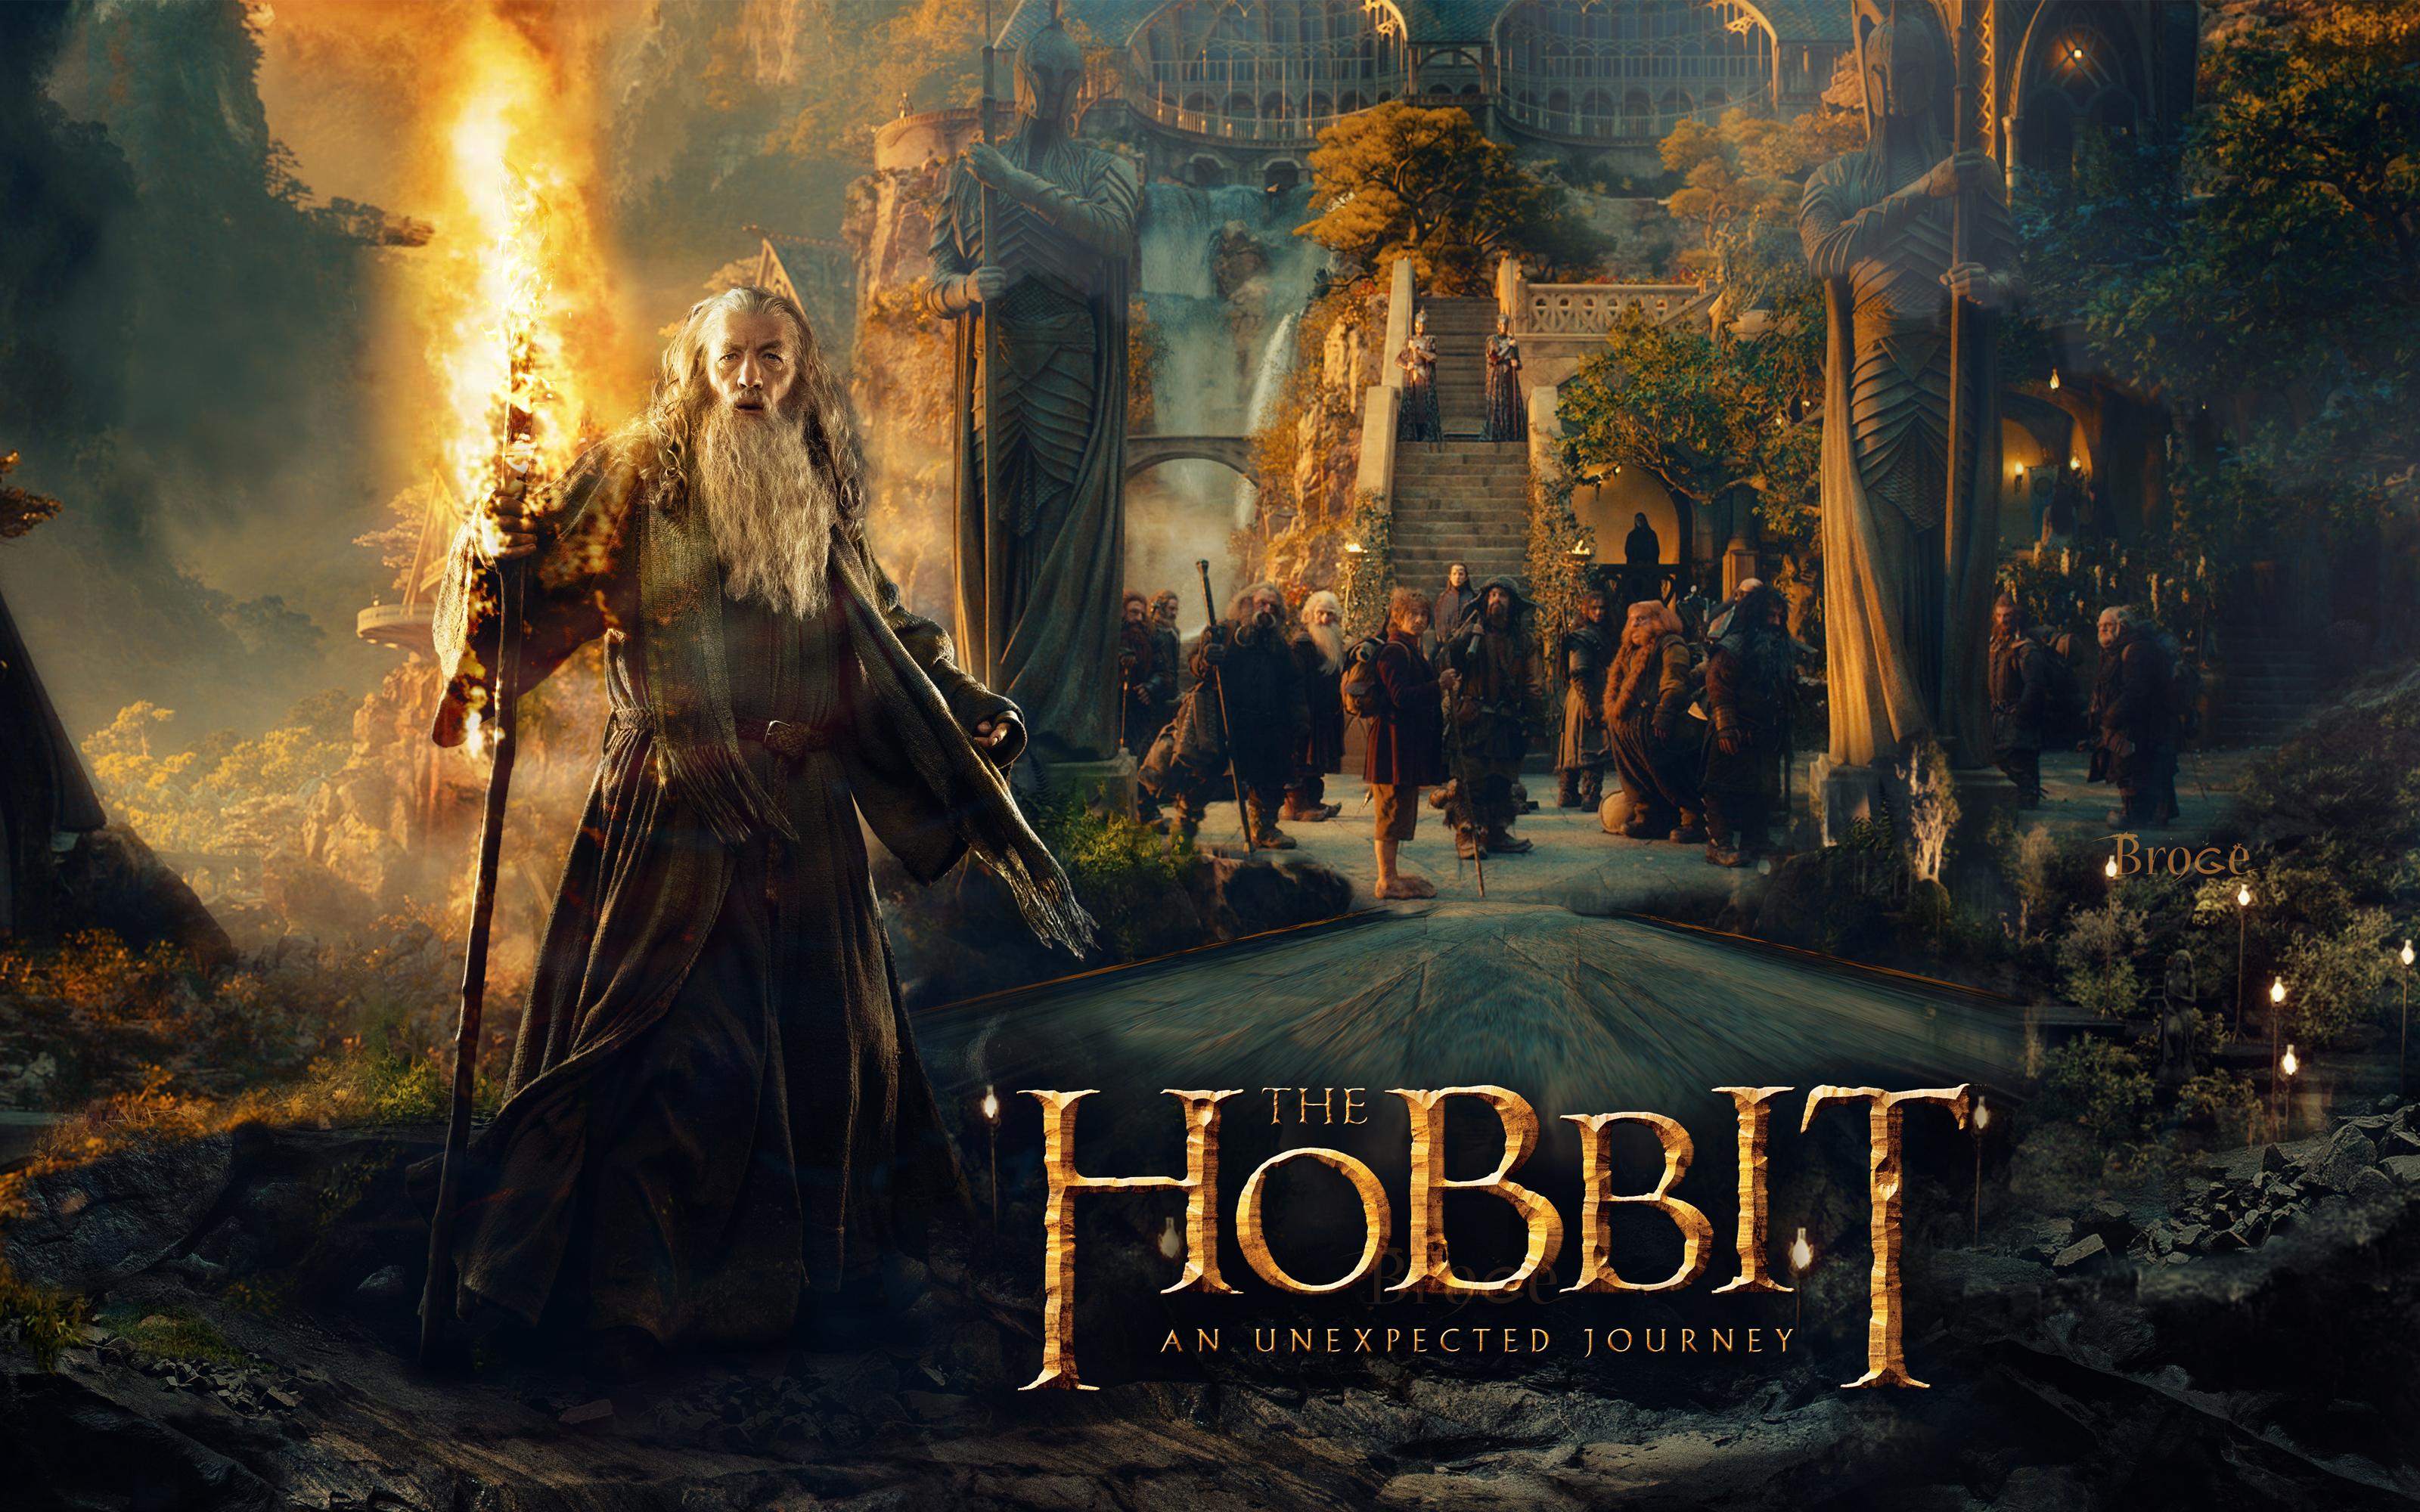 The Hobbit 2 Wallpaper Desolation Of Smaug HD 3200x2000